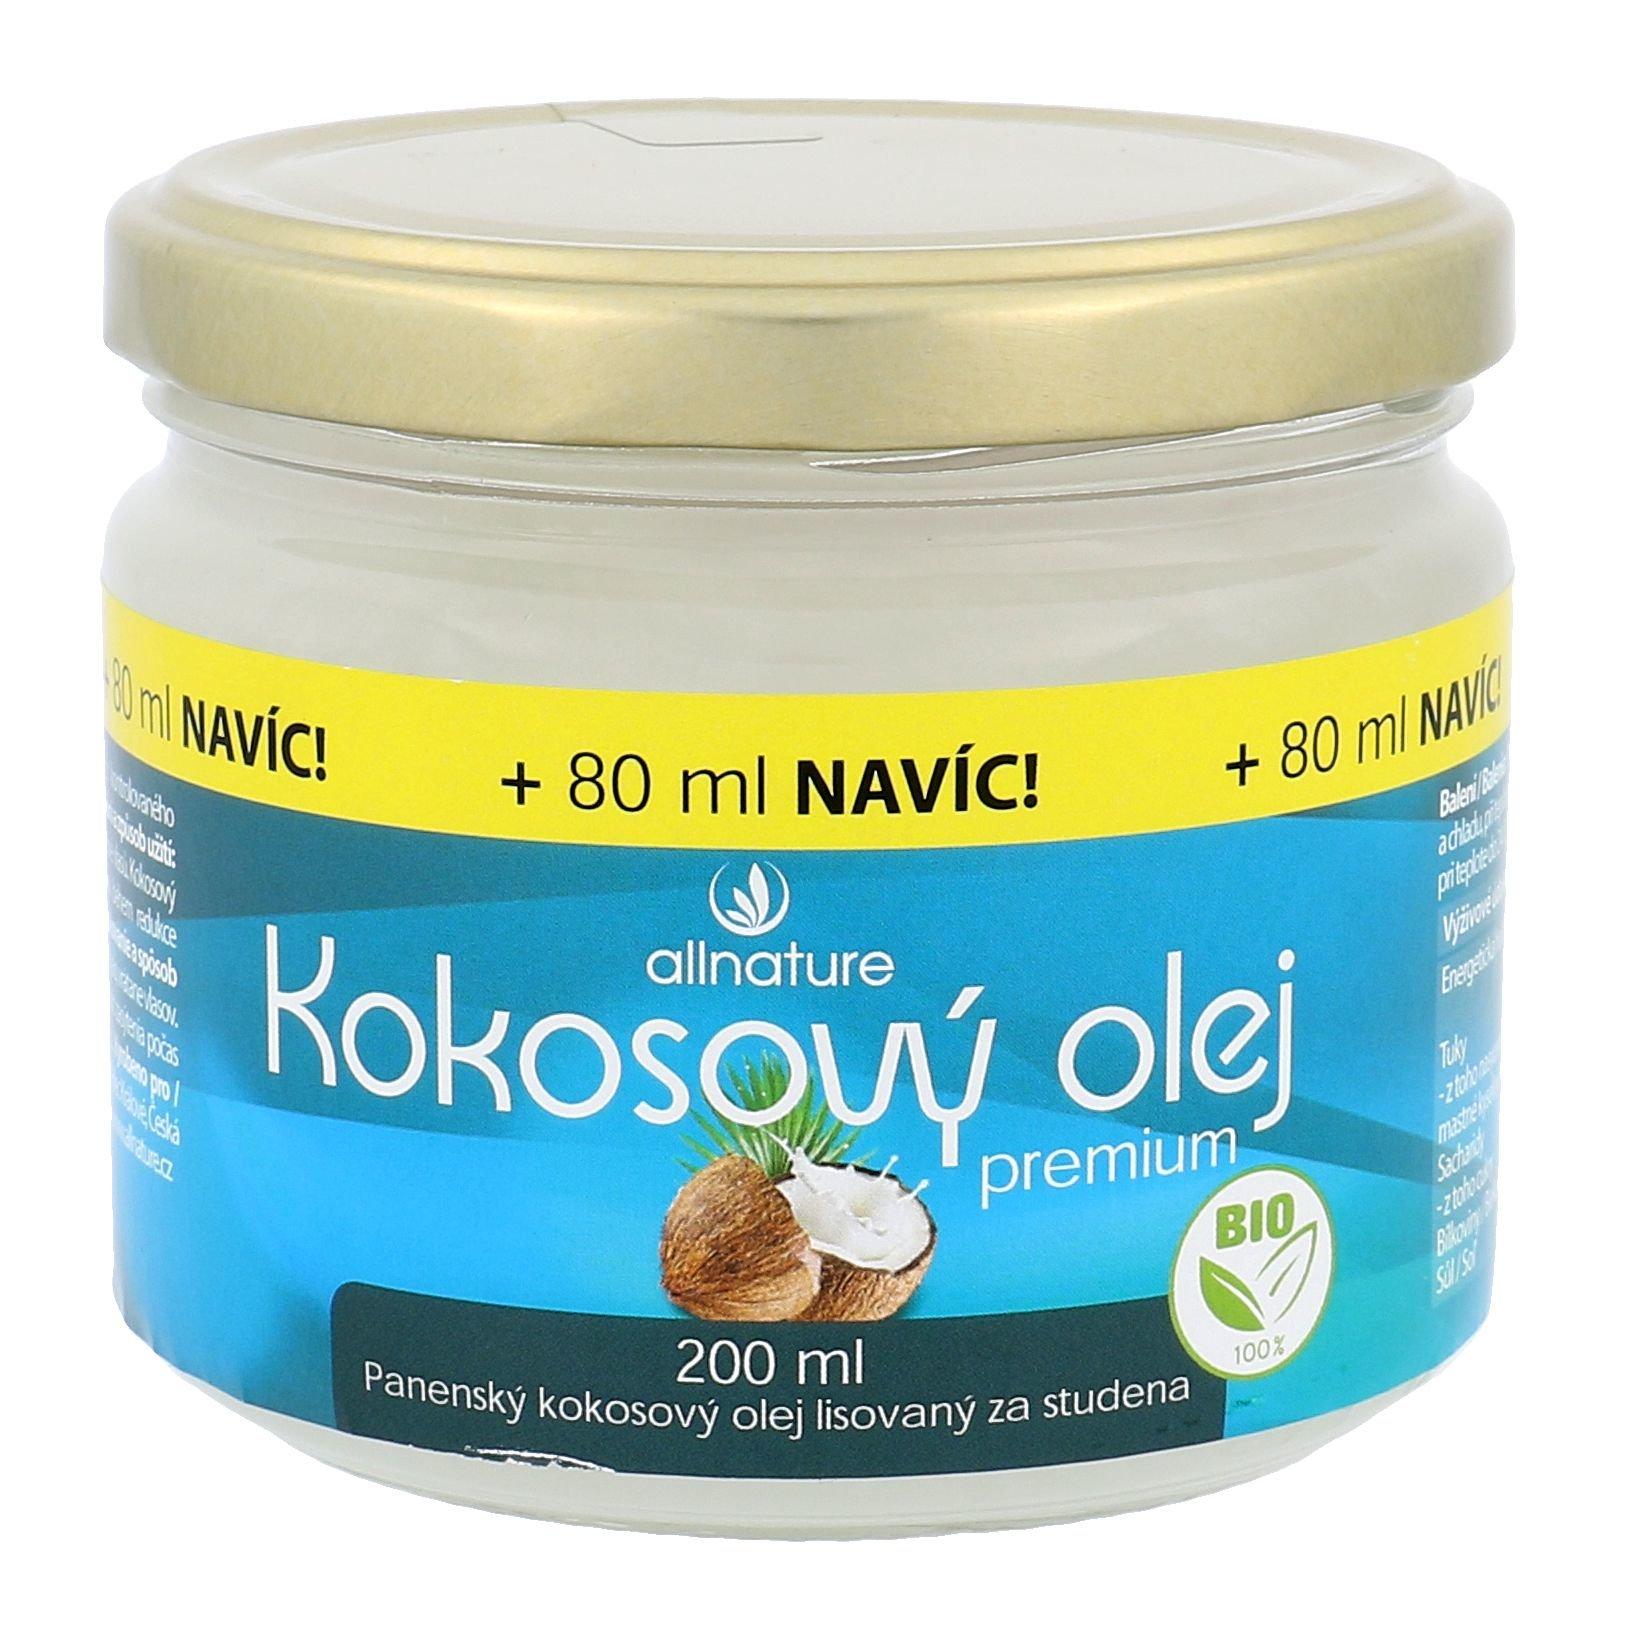 Allnature Premium Bio Coconut Oil Cosmetic 280ml